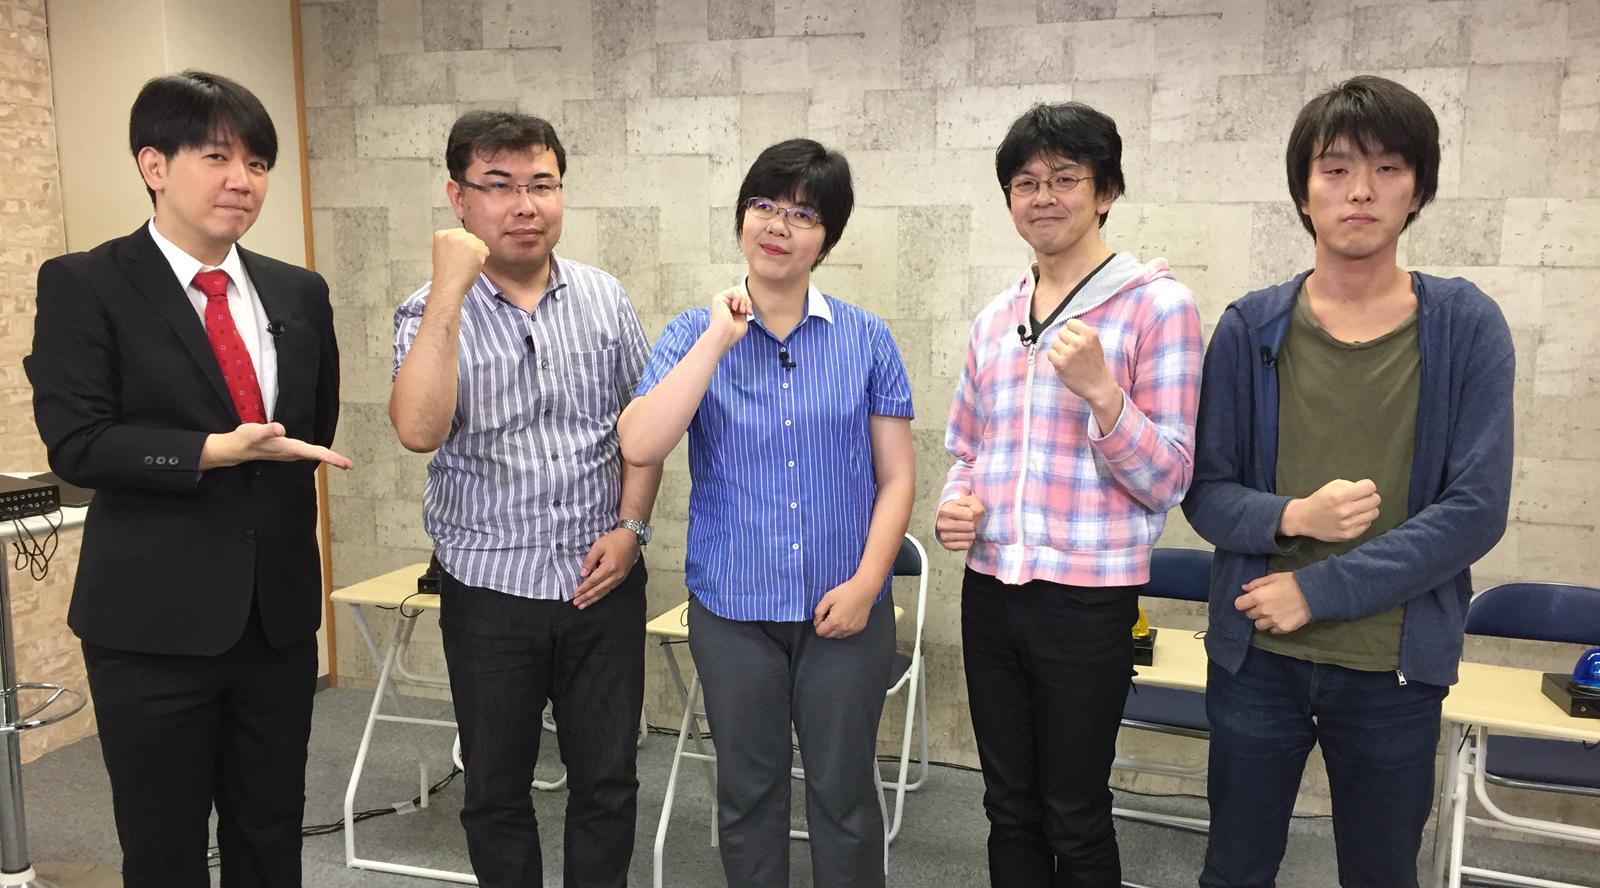 QUIZ JAPAN TVのオリジナルクイズ番組「魁!!クイズ塾」第25回は「QMAプレイヤー大会」!